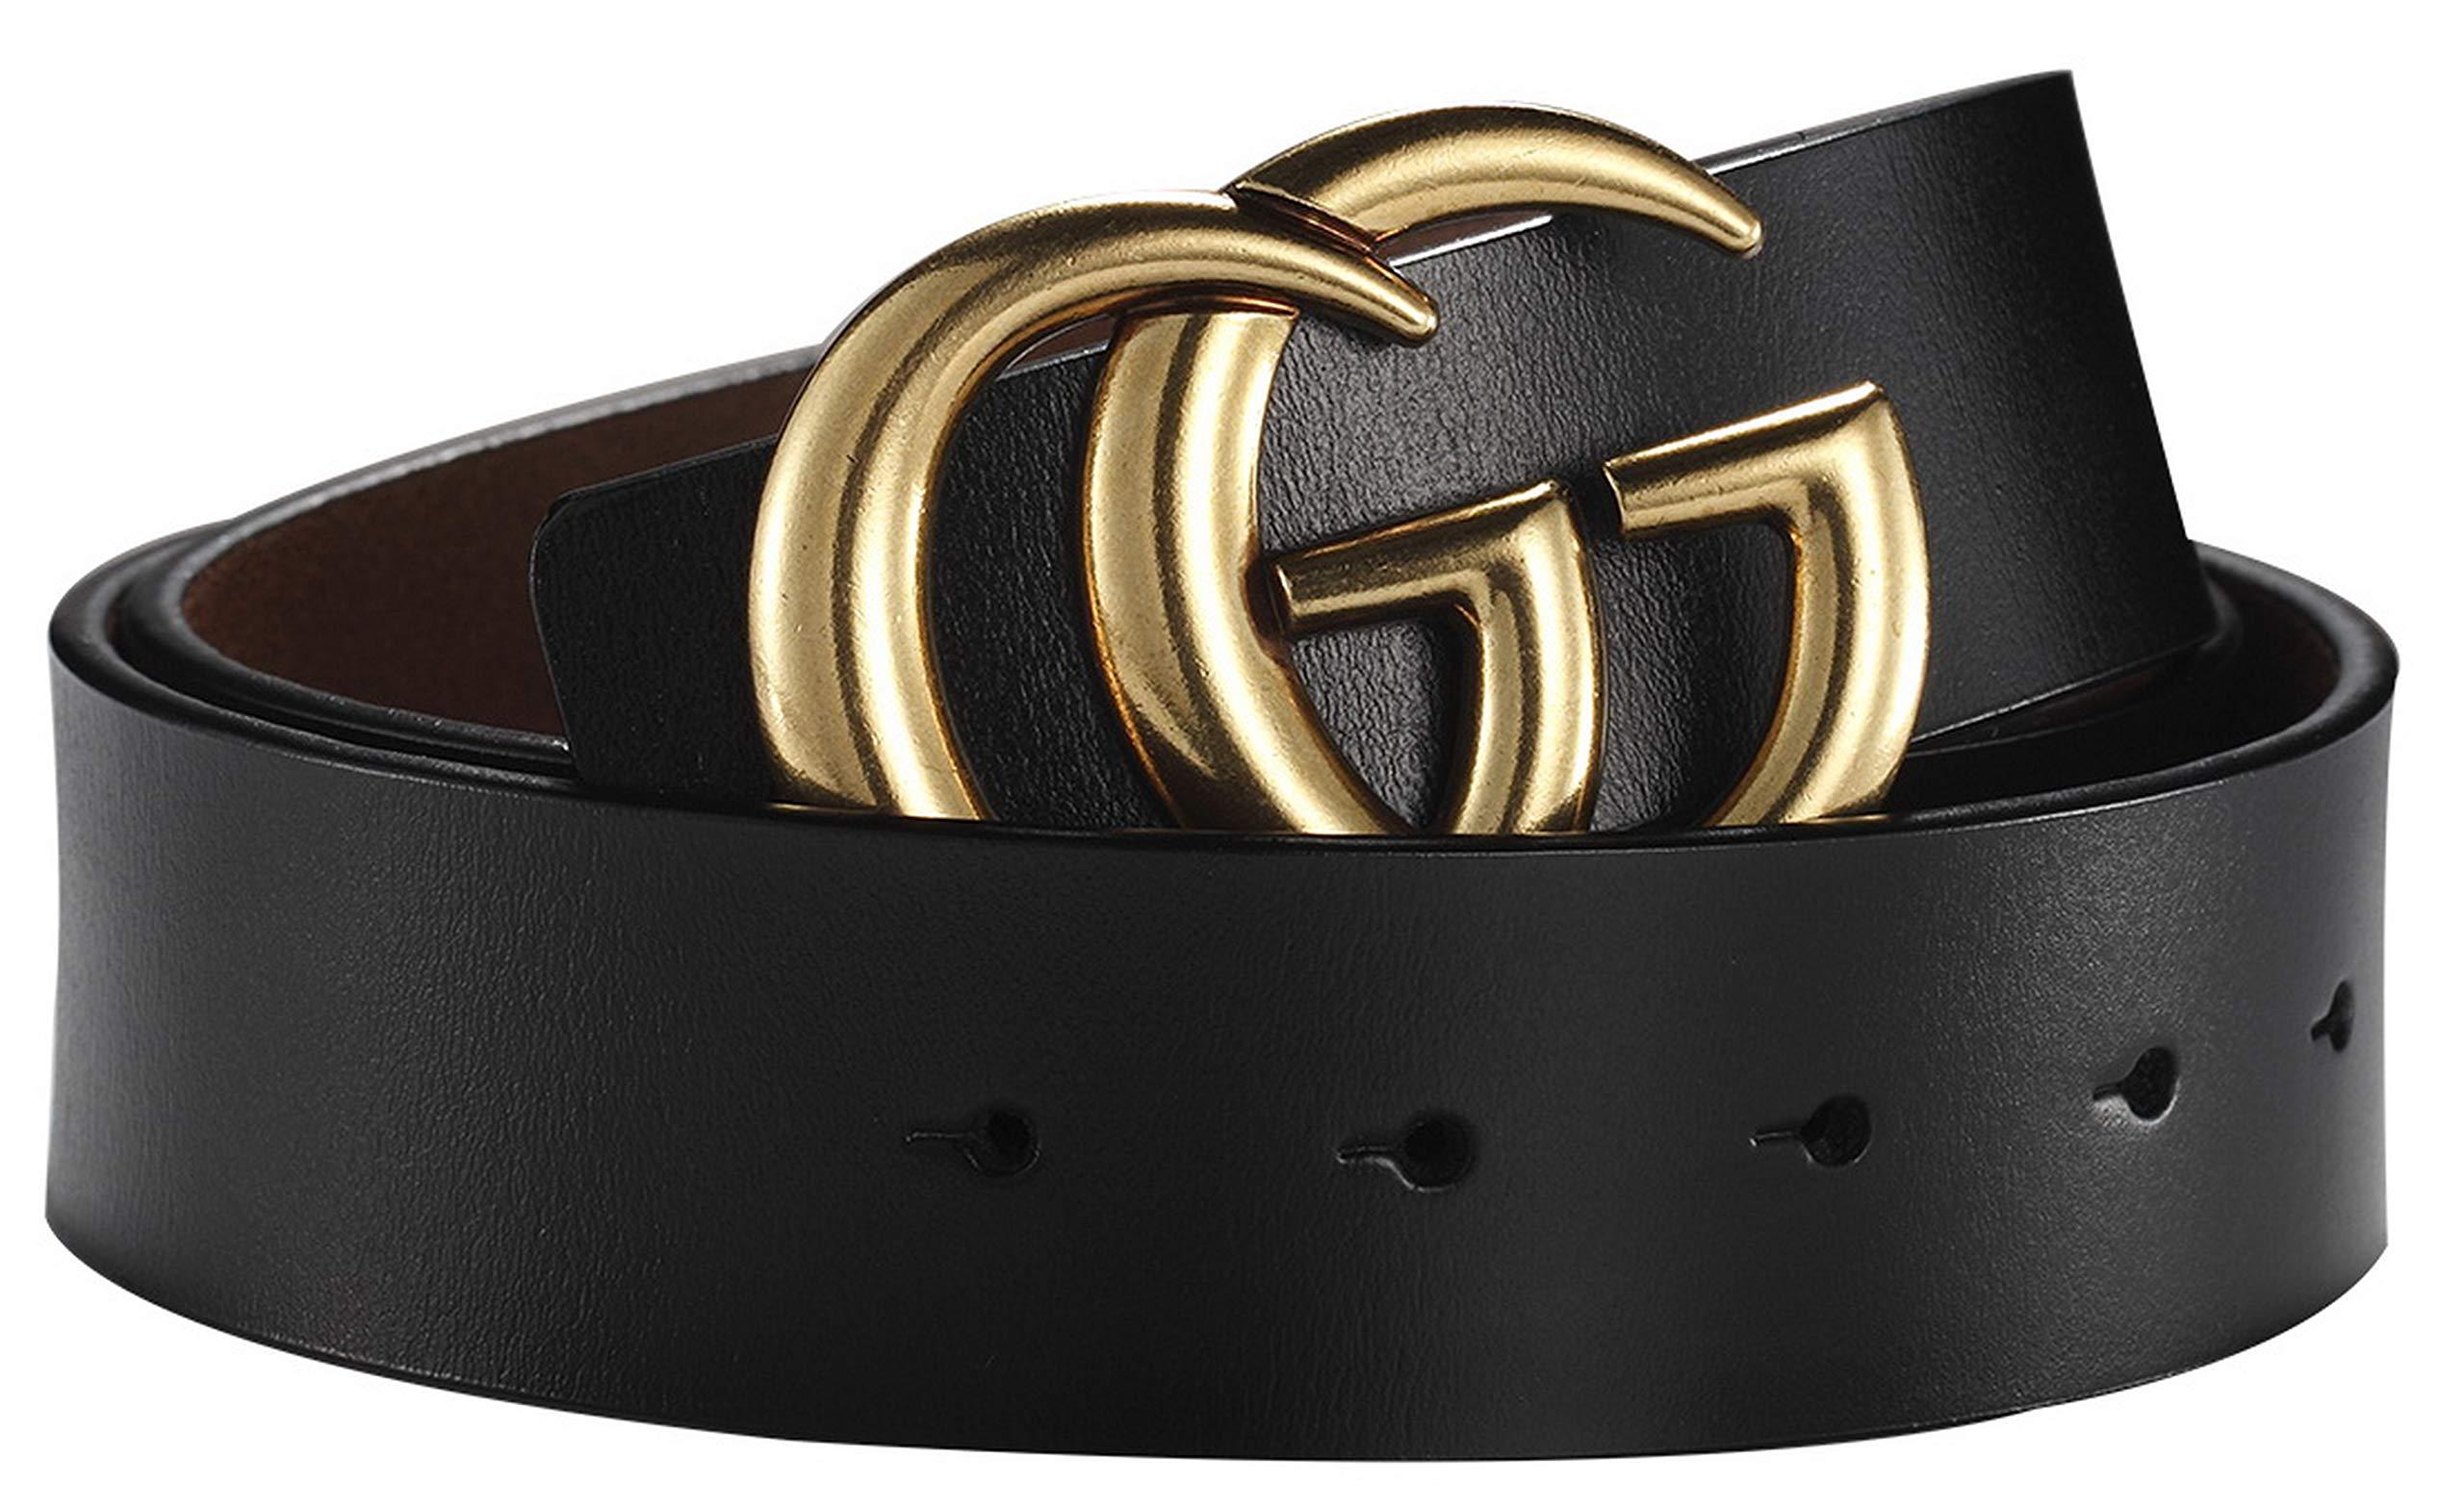 Big Hot Gold Buckle Leather Belt for Women Lady Unisex - USA Fast Deliver 2-7 Days Guarantee - 3.8cm Belt Width (100cm (Waist 29''~35''), Black)